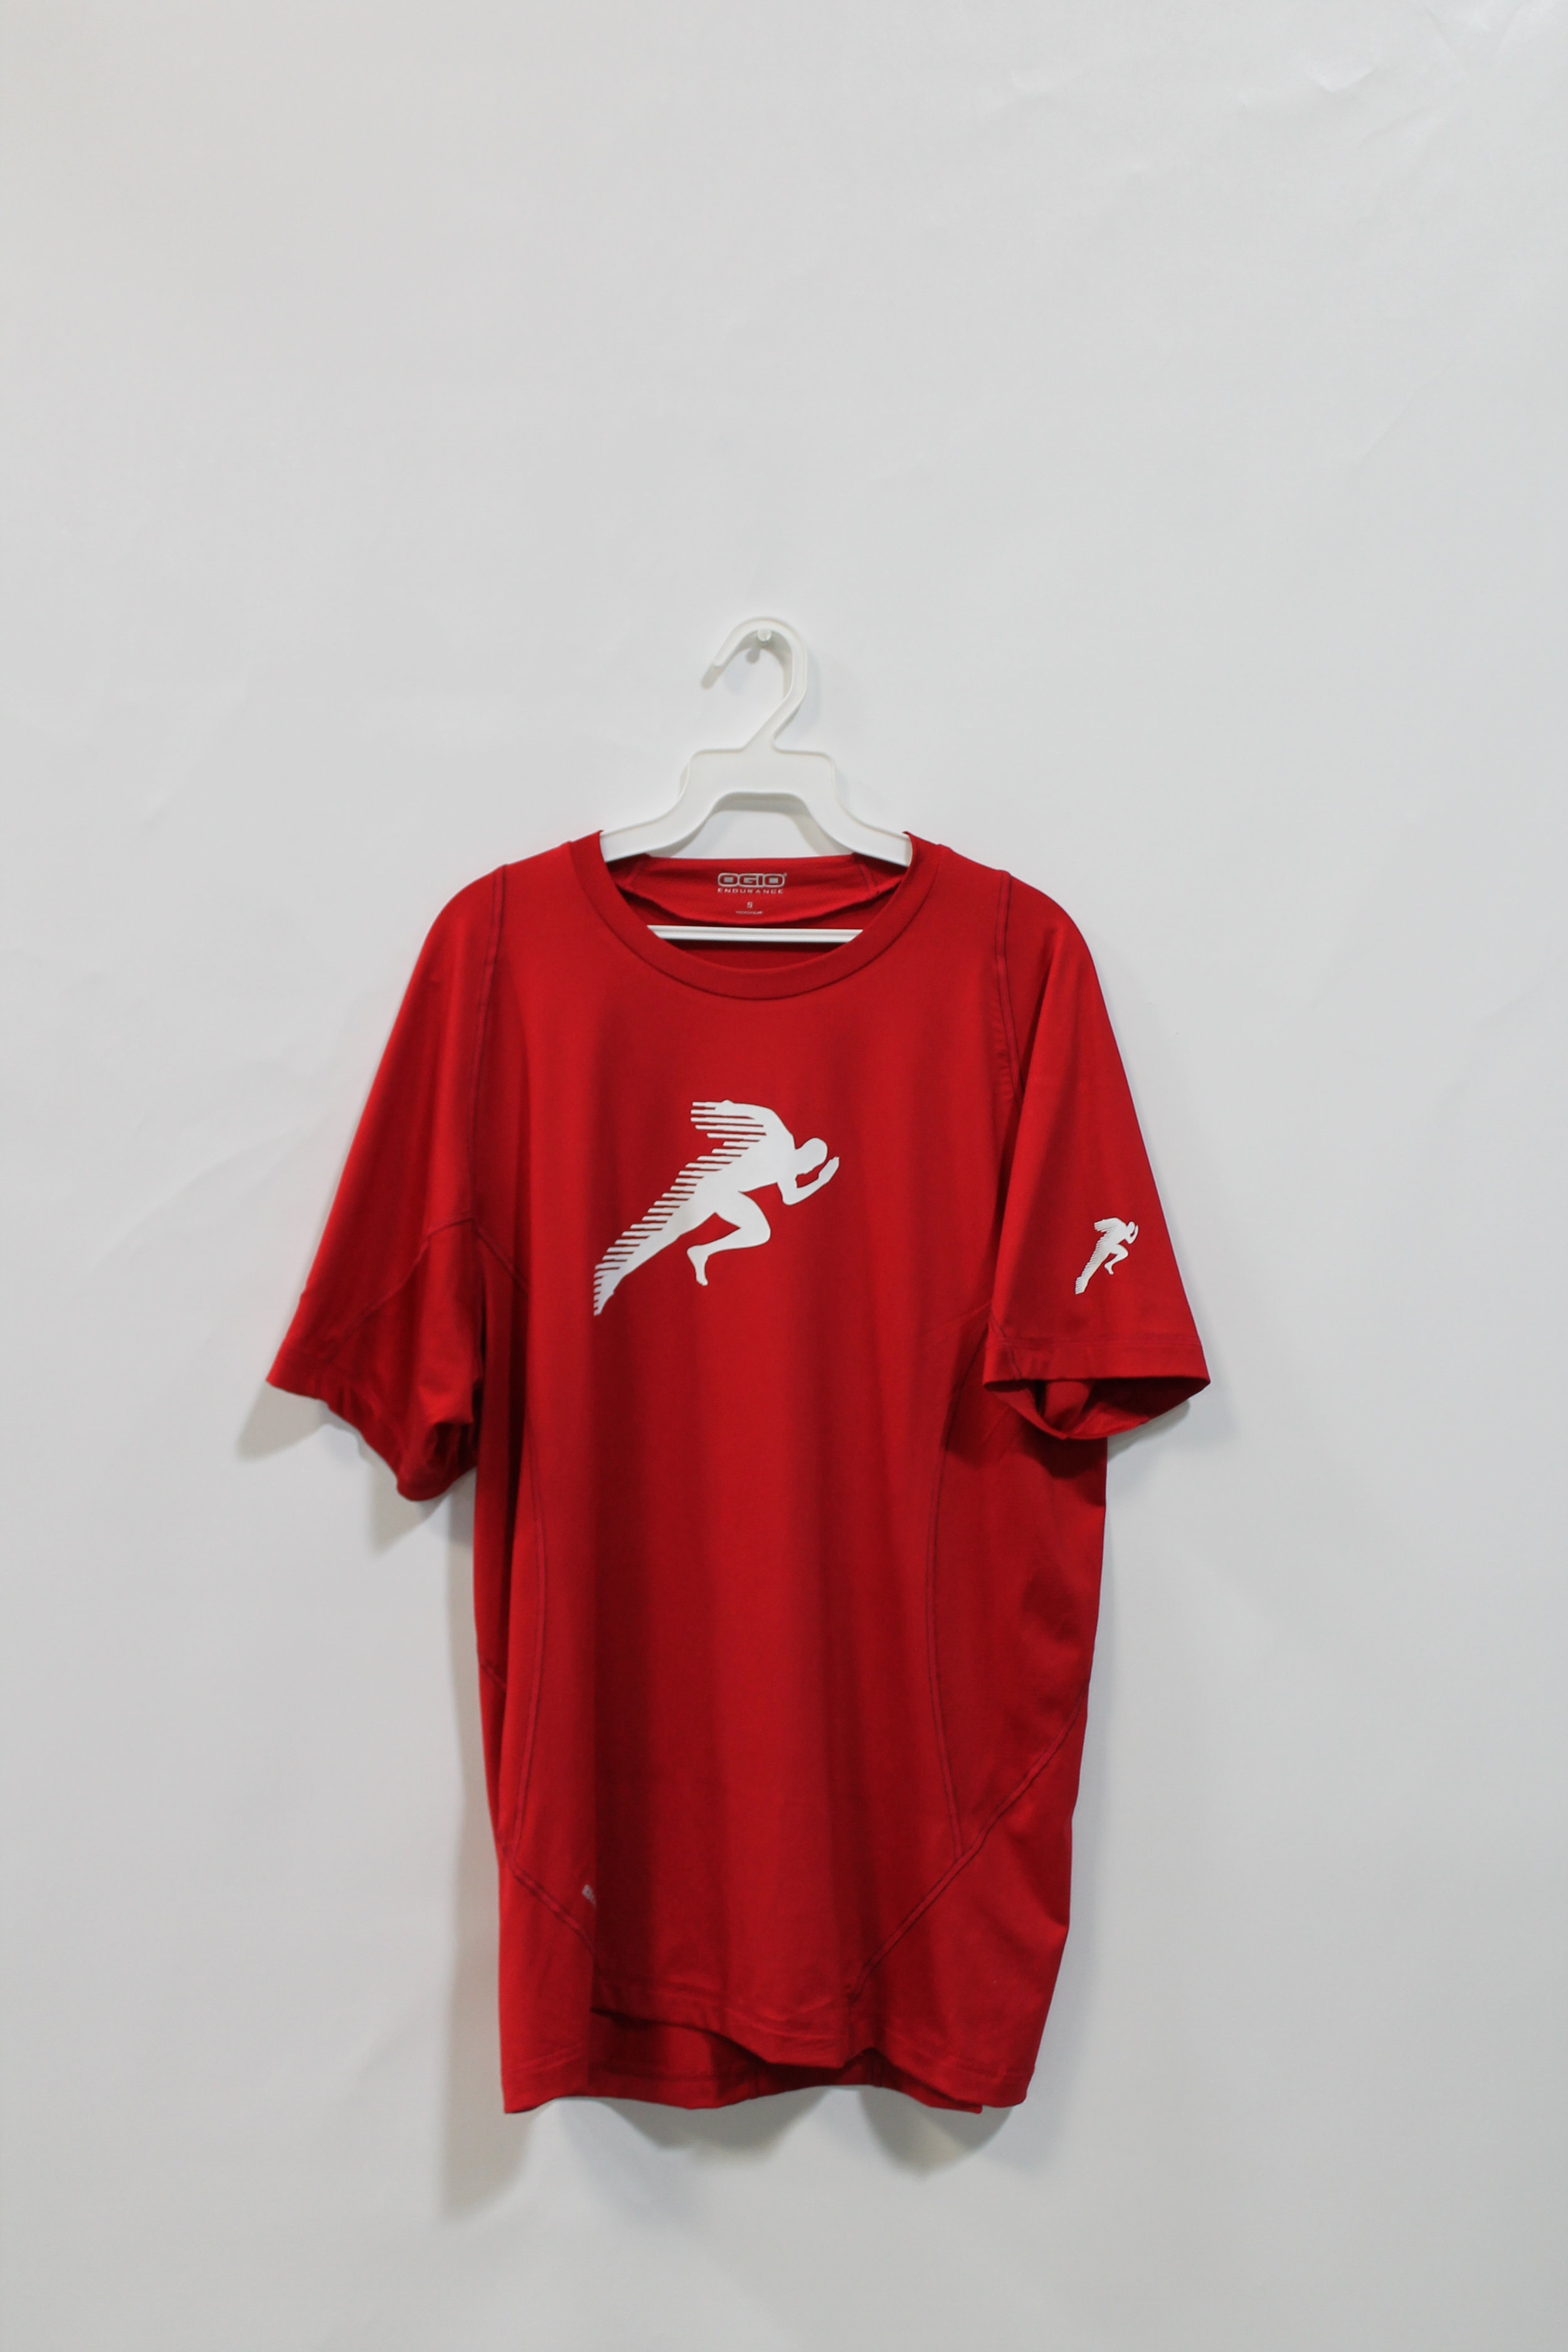 Running_Shirt.JPG